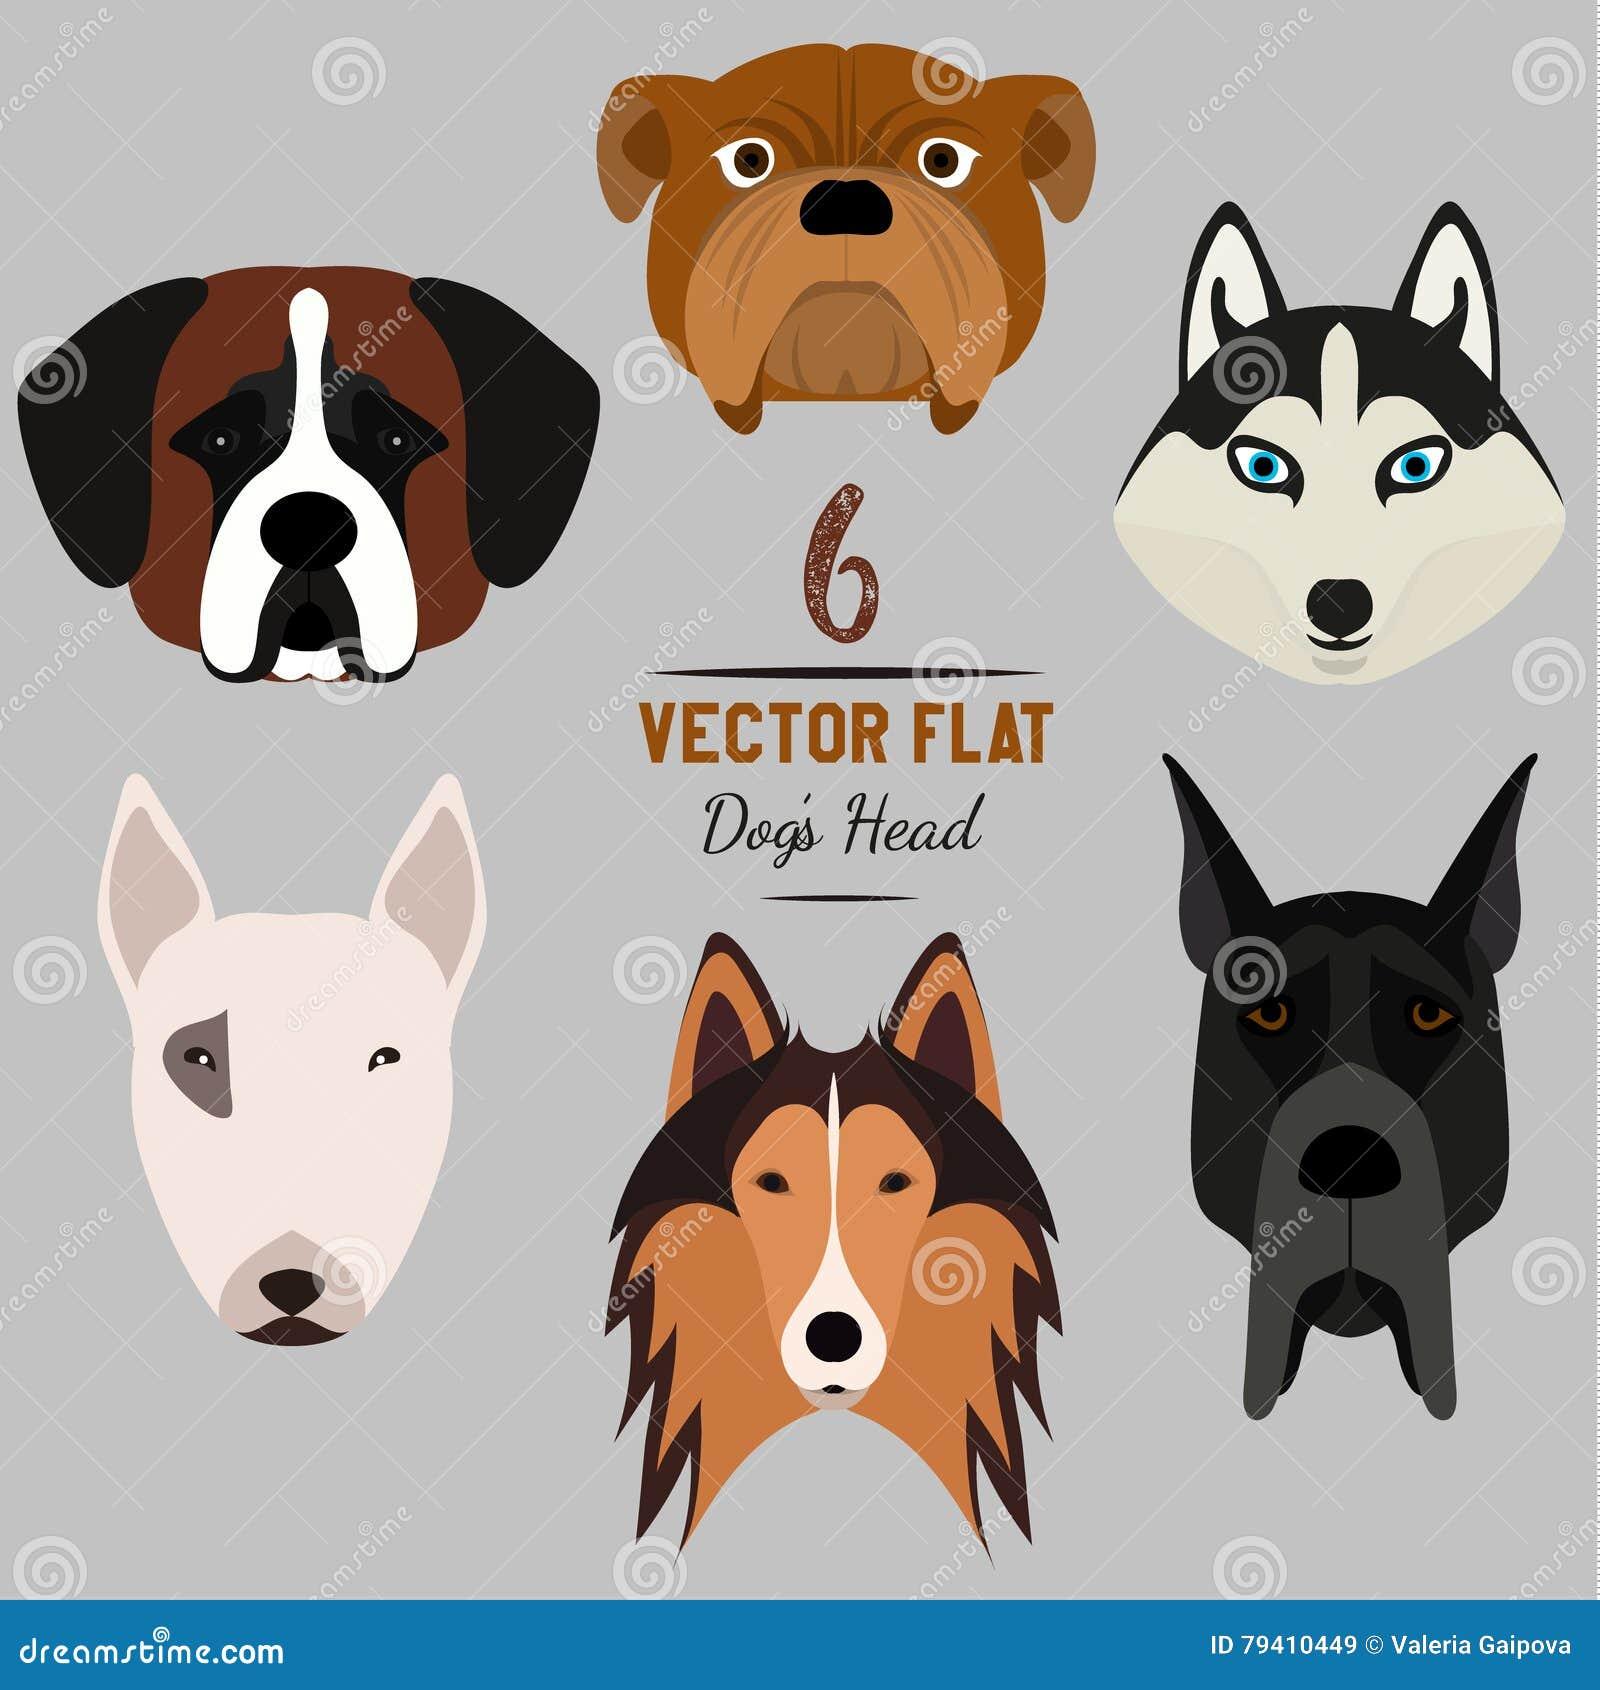 Set of 6 dog s head. Flat design. Pets. Cute doggies